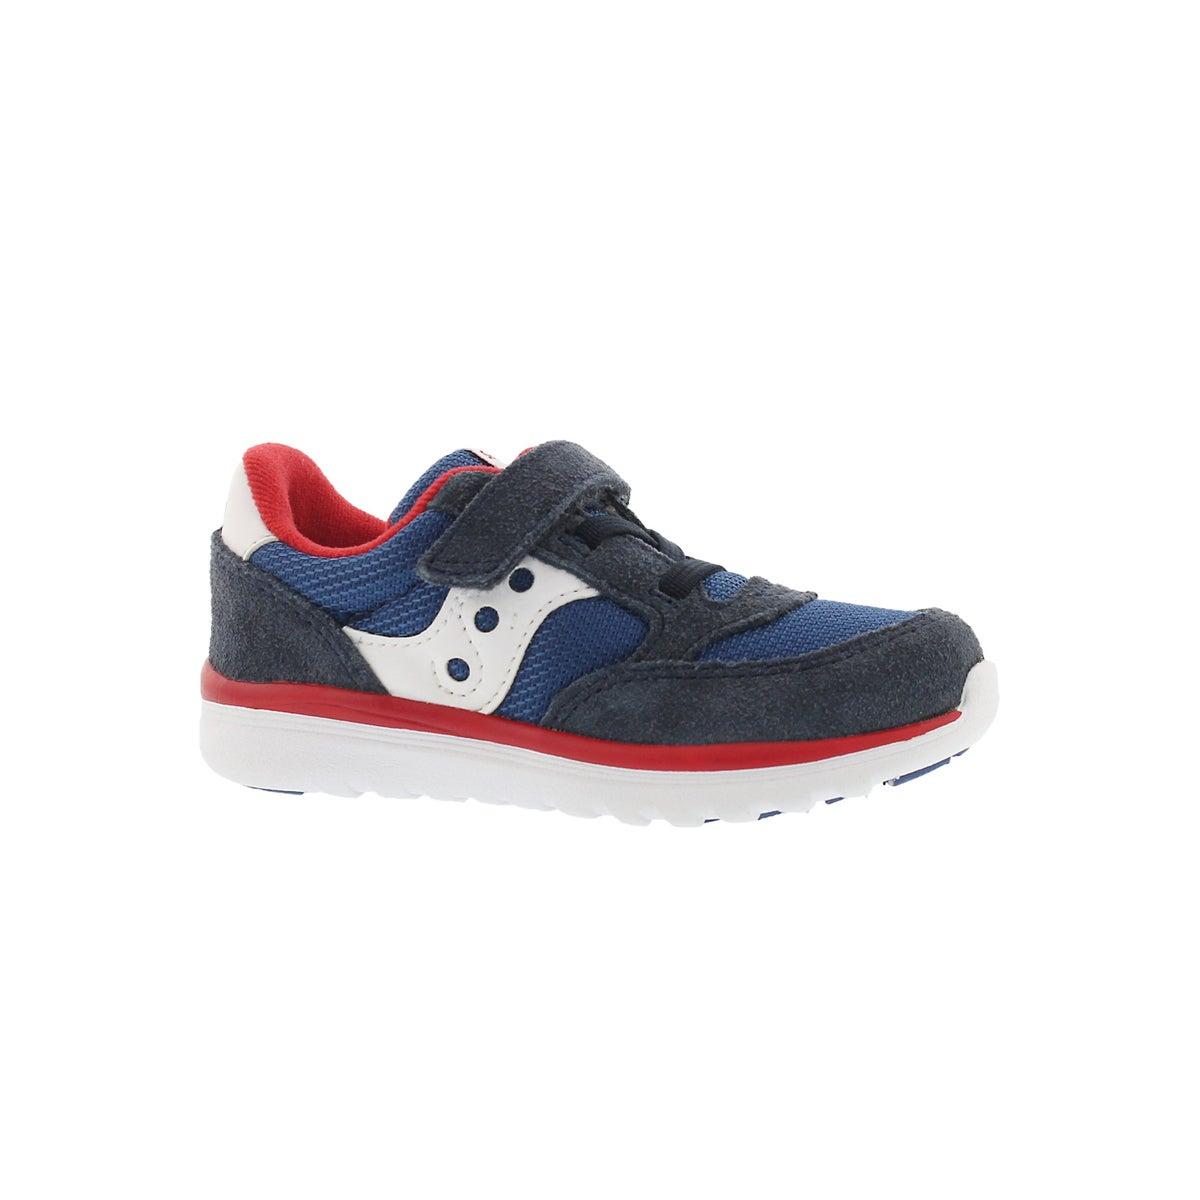 Infants' JAZZ LITE navy/red sneakers -  Wide